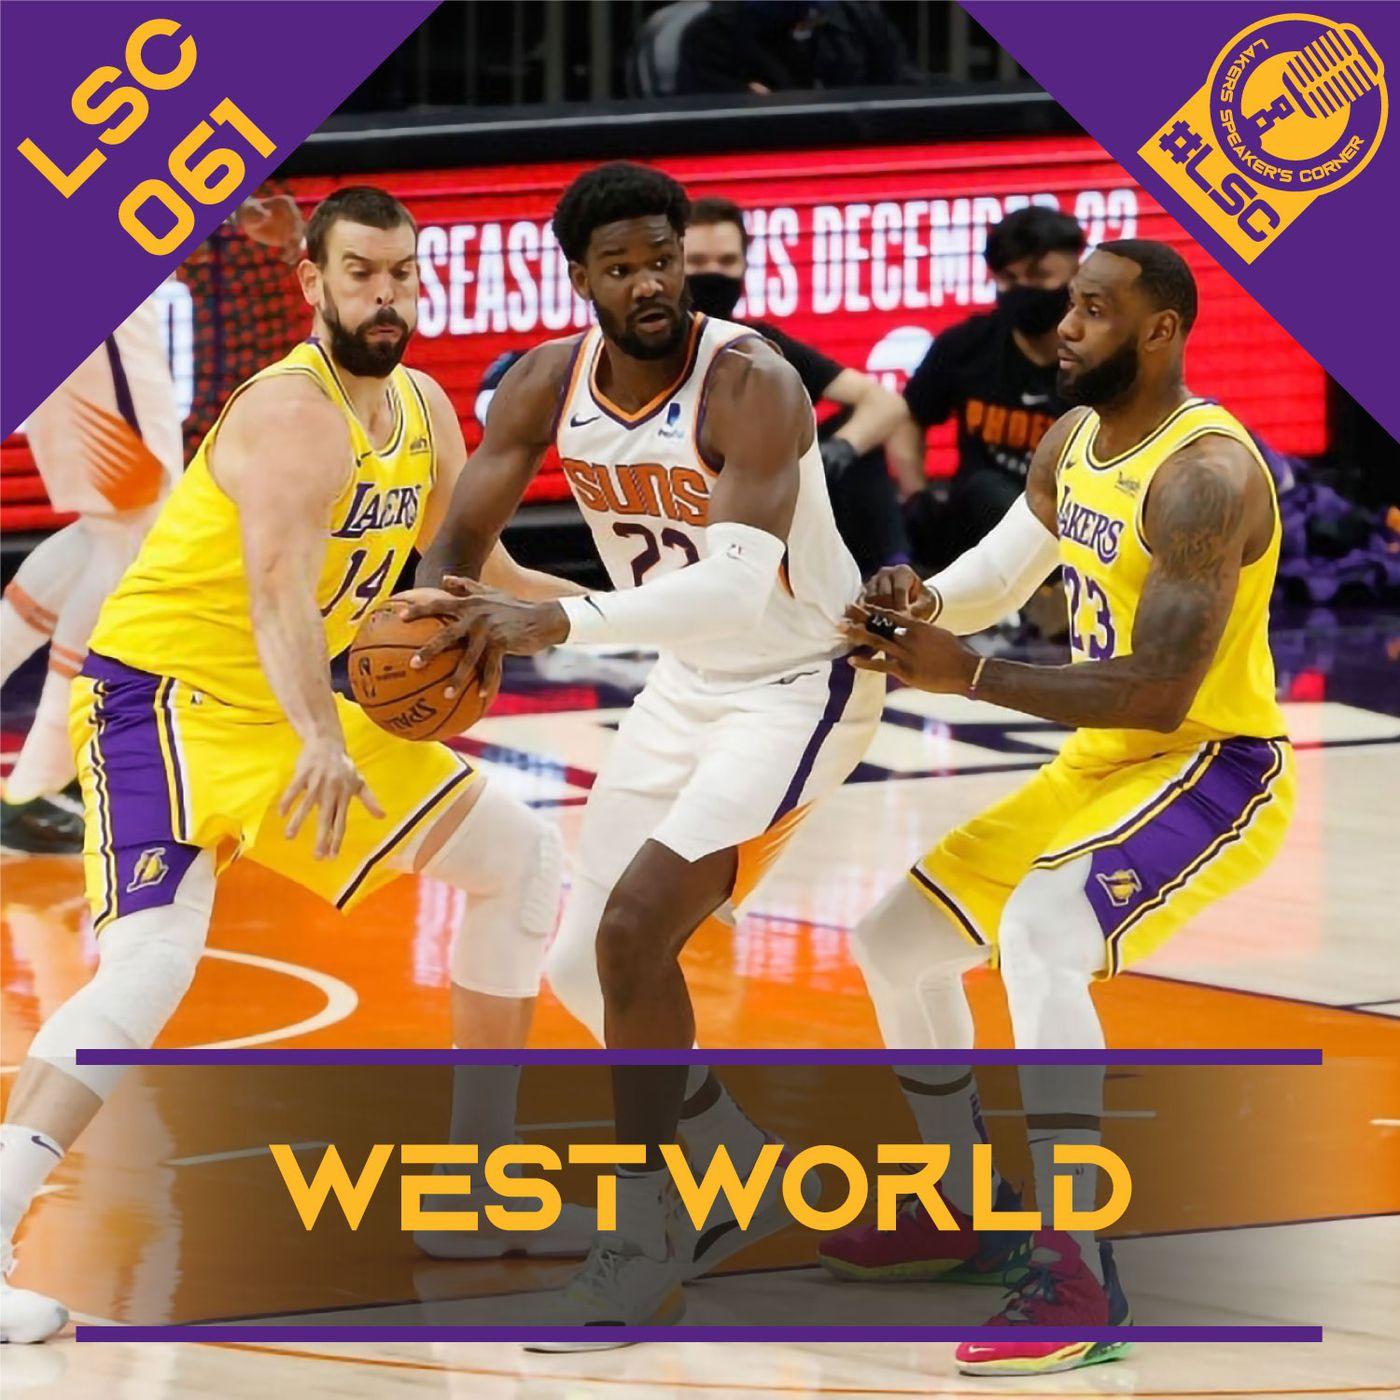 LSC 061 - Westworld feat. Andrea Bandiziol